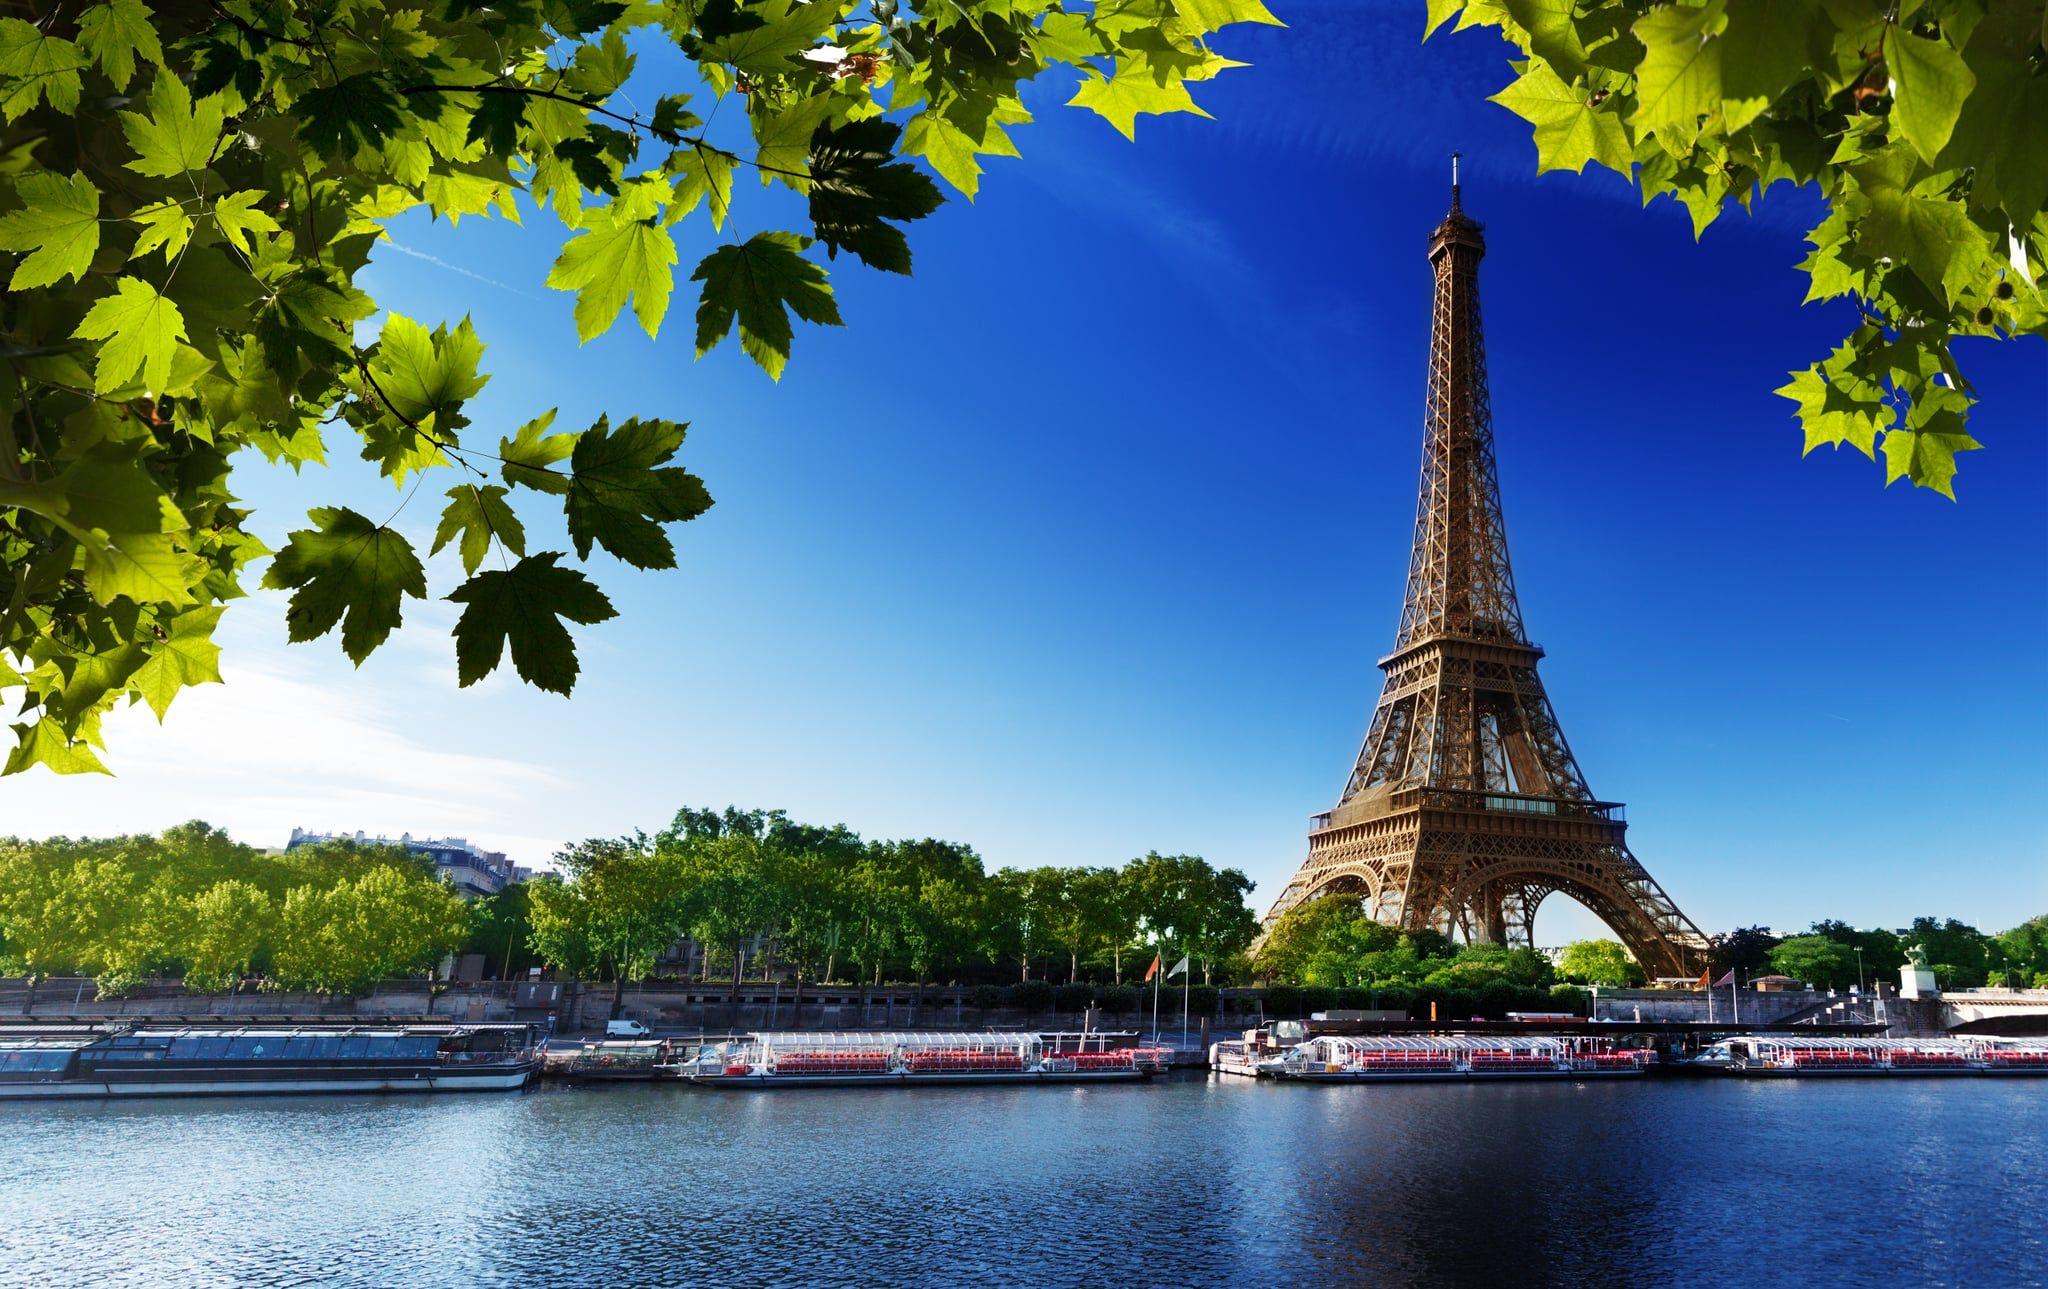 Paris Zoom Background In 2020 Eiffel Tower Tour Eiffel Tower At Night Eiffel Tower